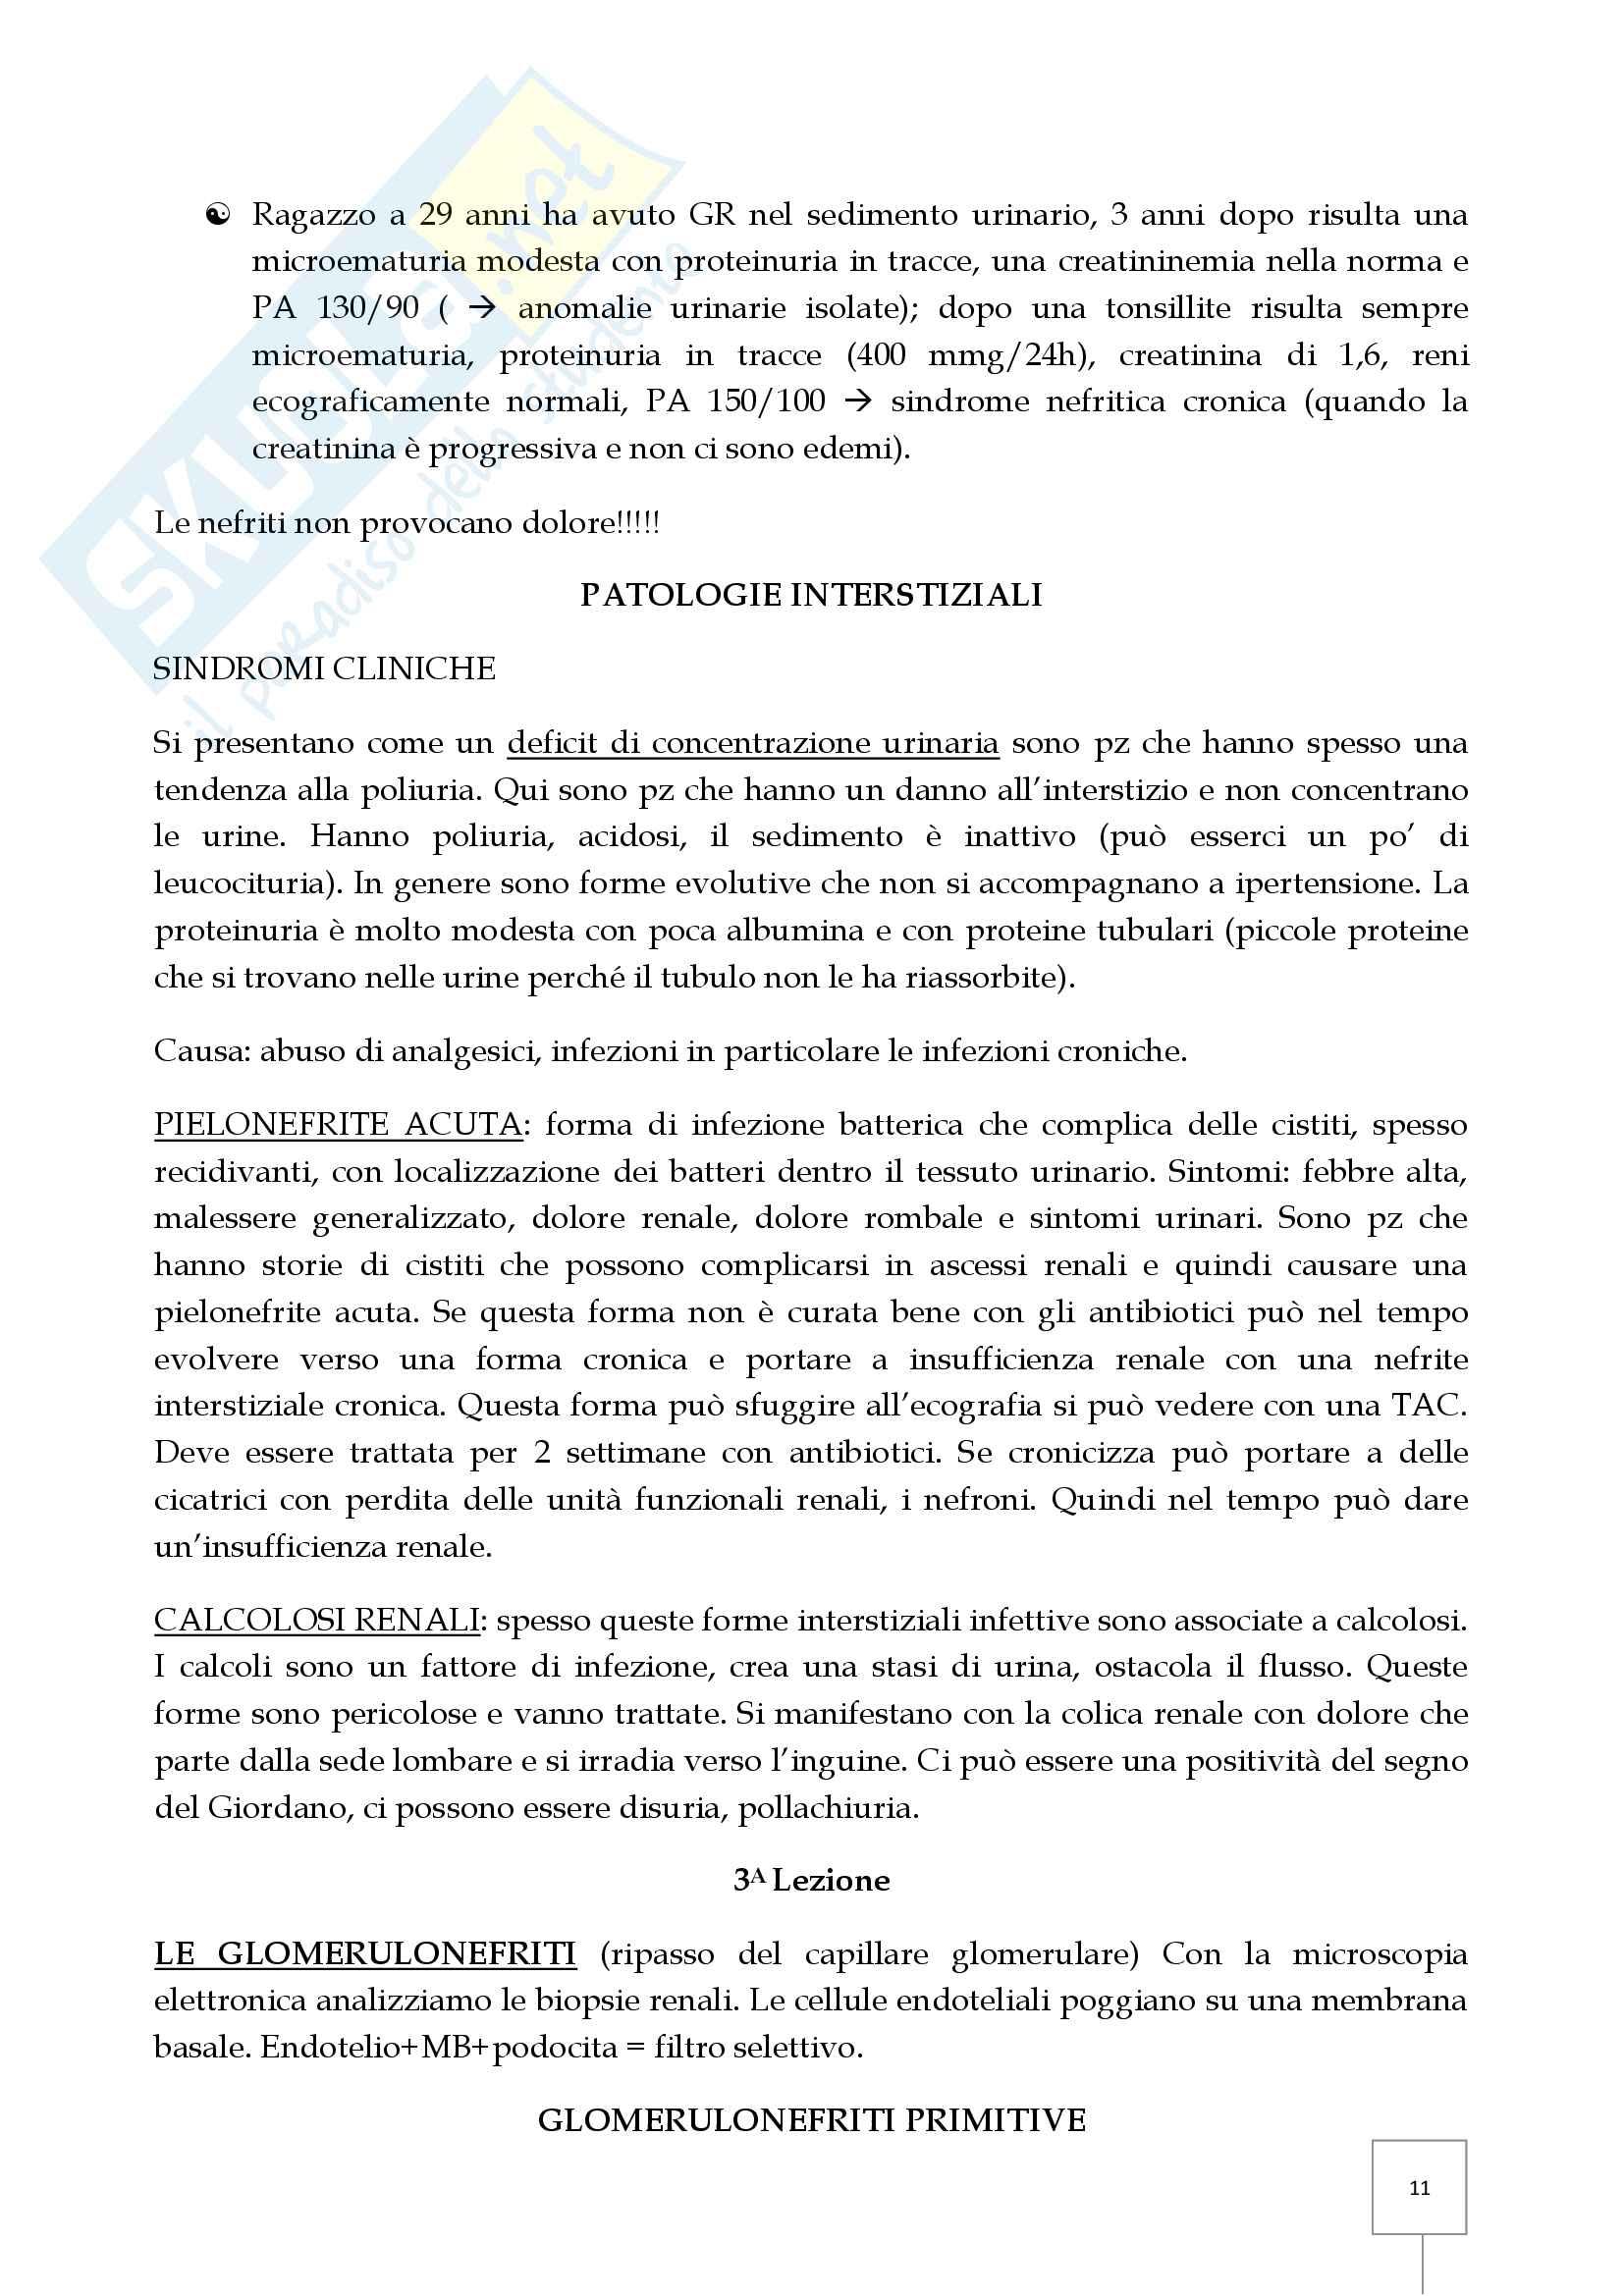 Nefrologia e dialisi - appunti Pag. 11